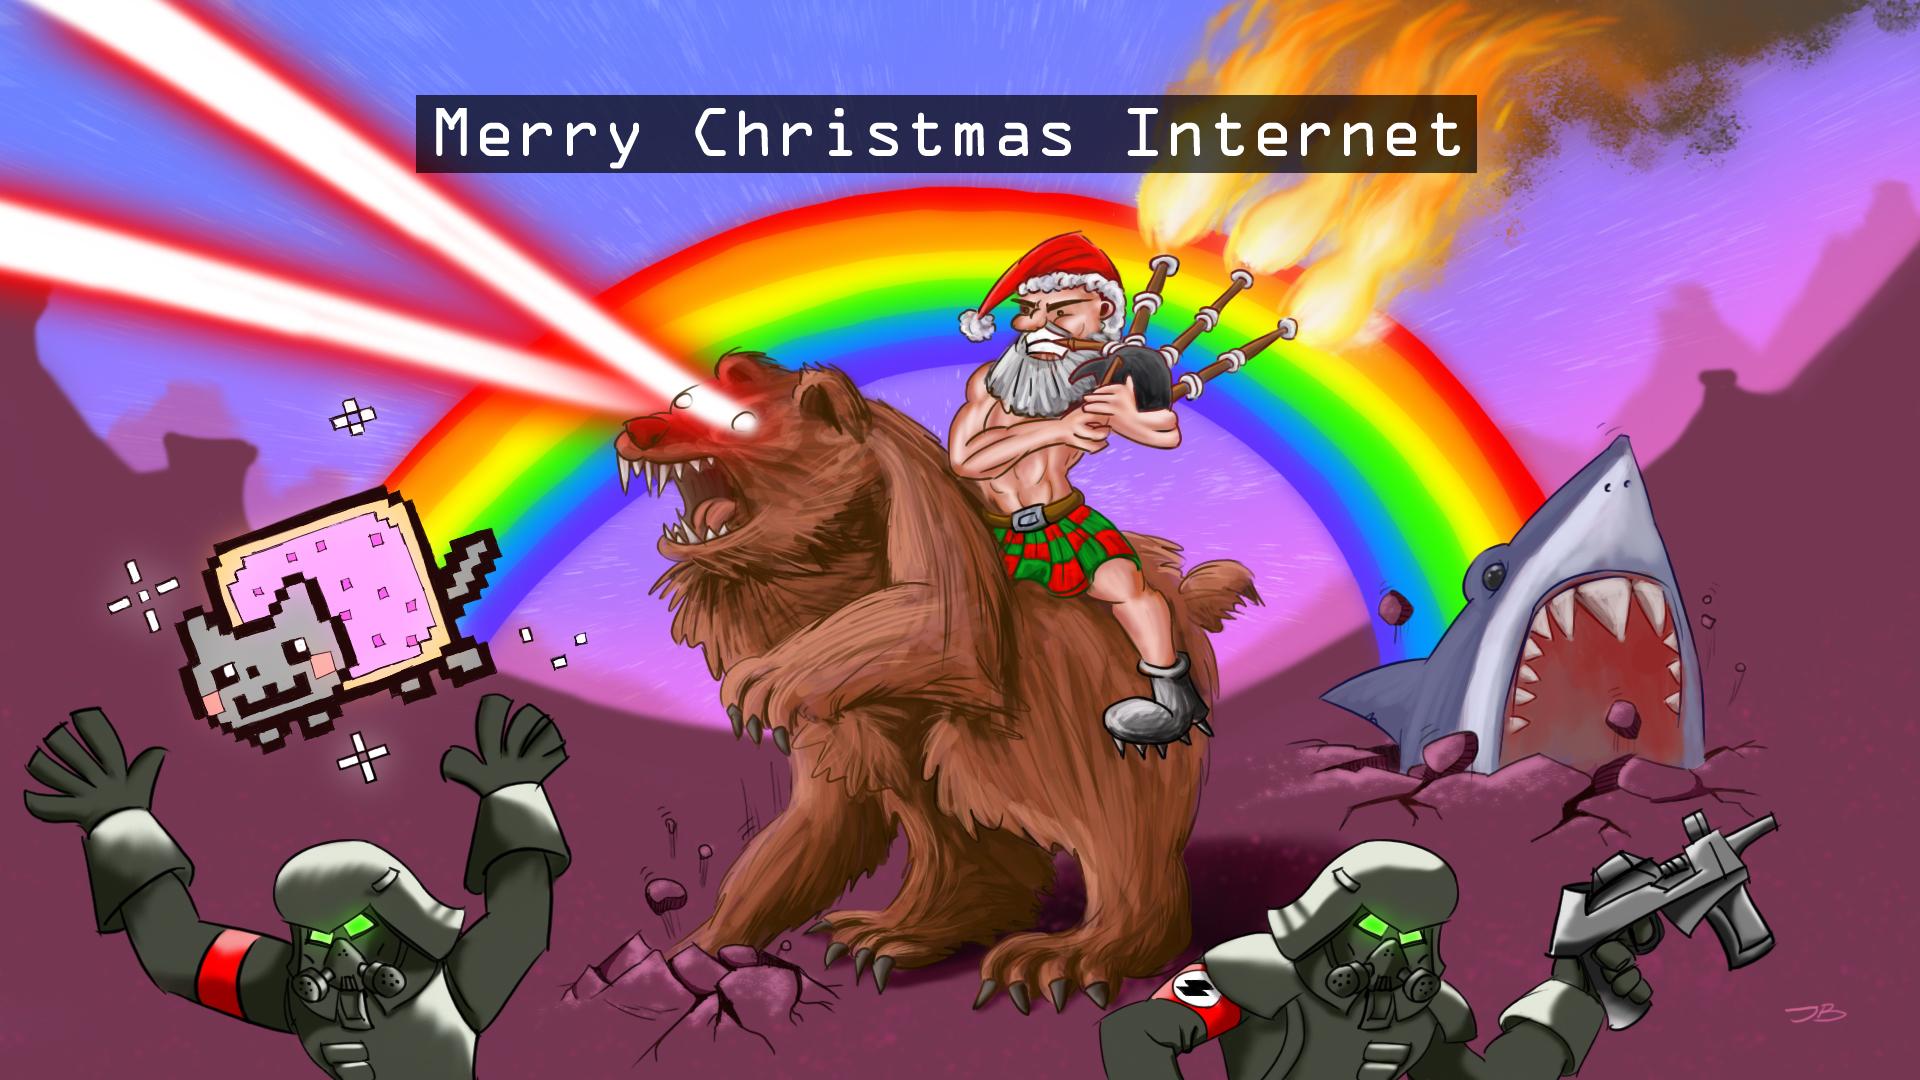 Merry Christmas Internet